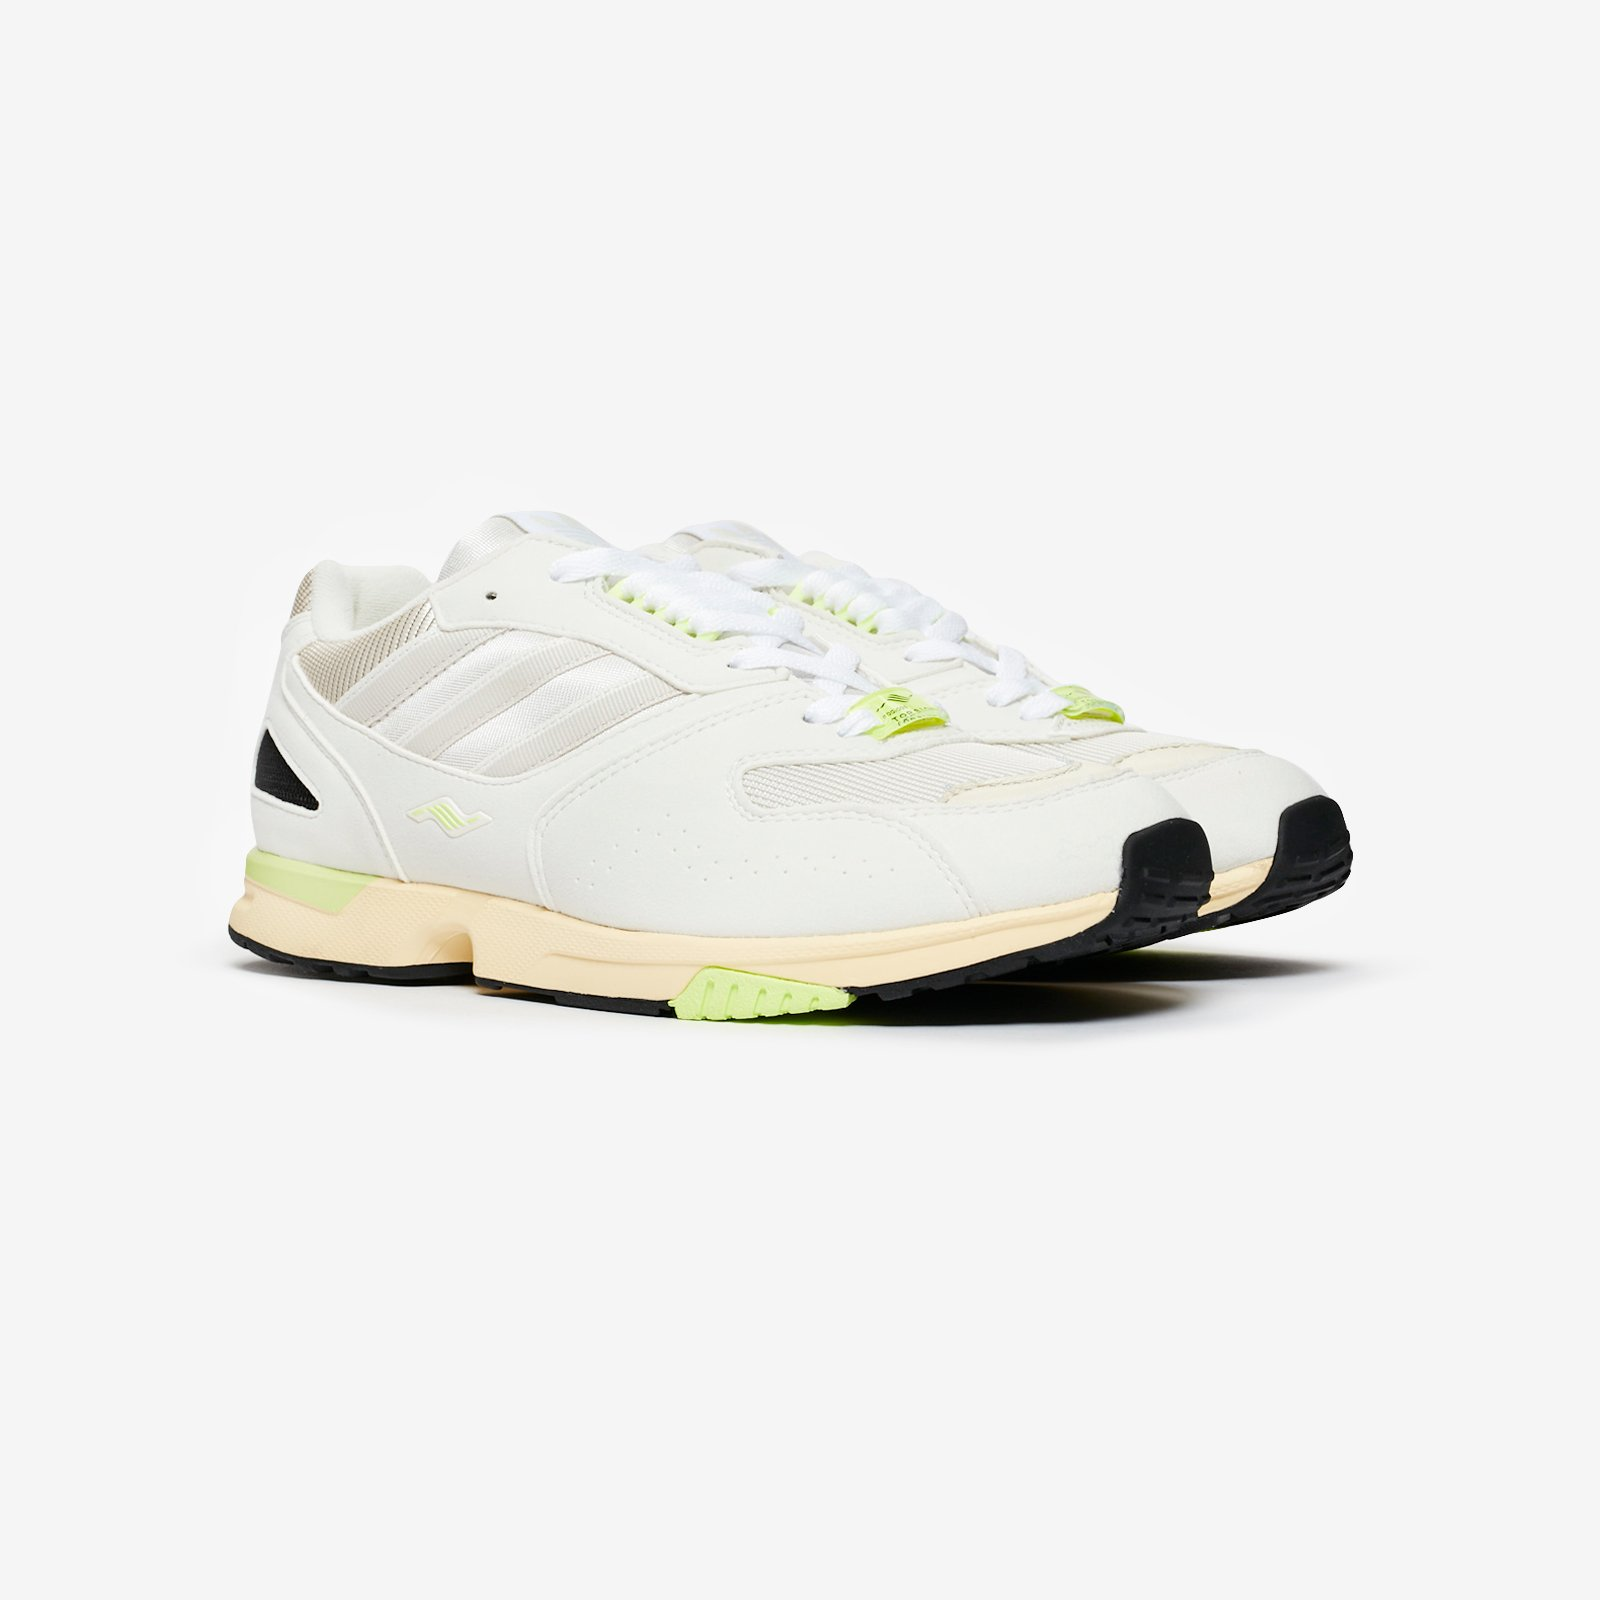 Sneakersamp; Sneakersnstuff 4000 I Adidas Ee4762 Streetwear Zx 0OPmvynN8w